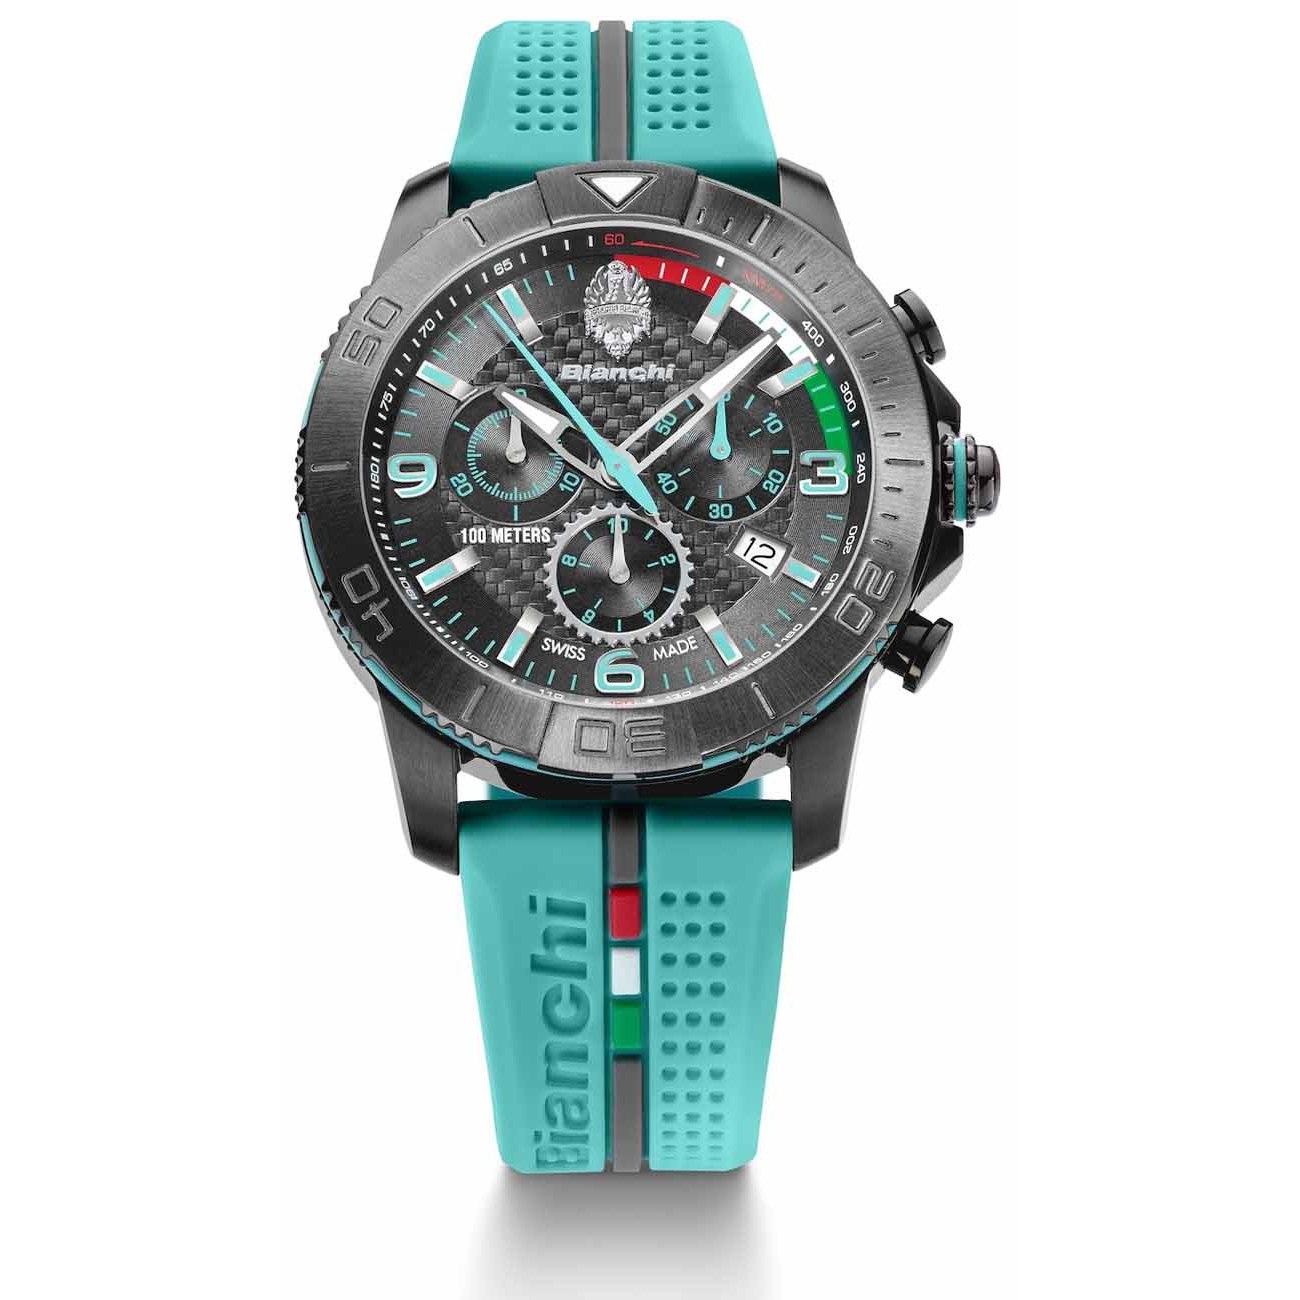 Bianchi Chronograph Wrist Watch - Celeste